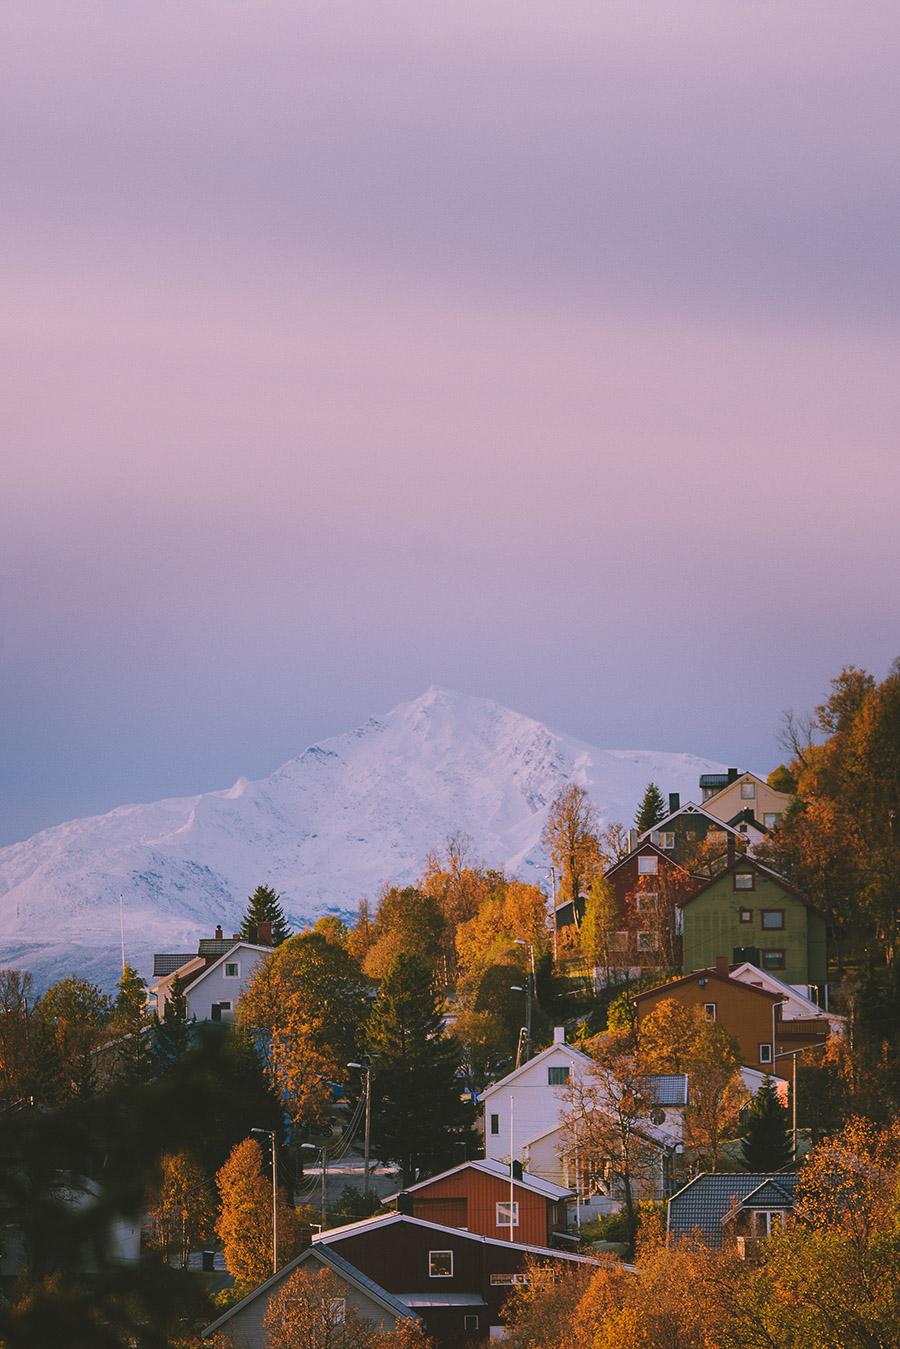 Colourful houses of Tromsø